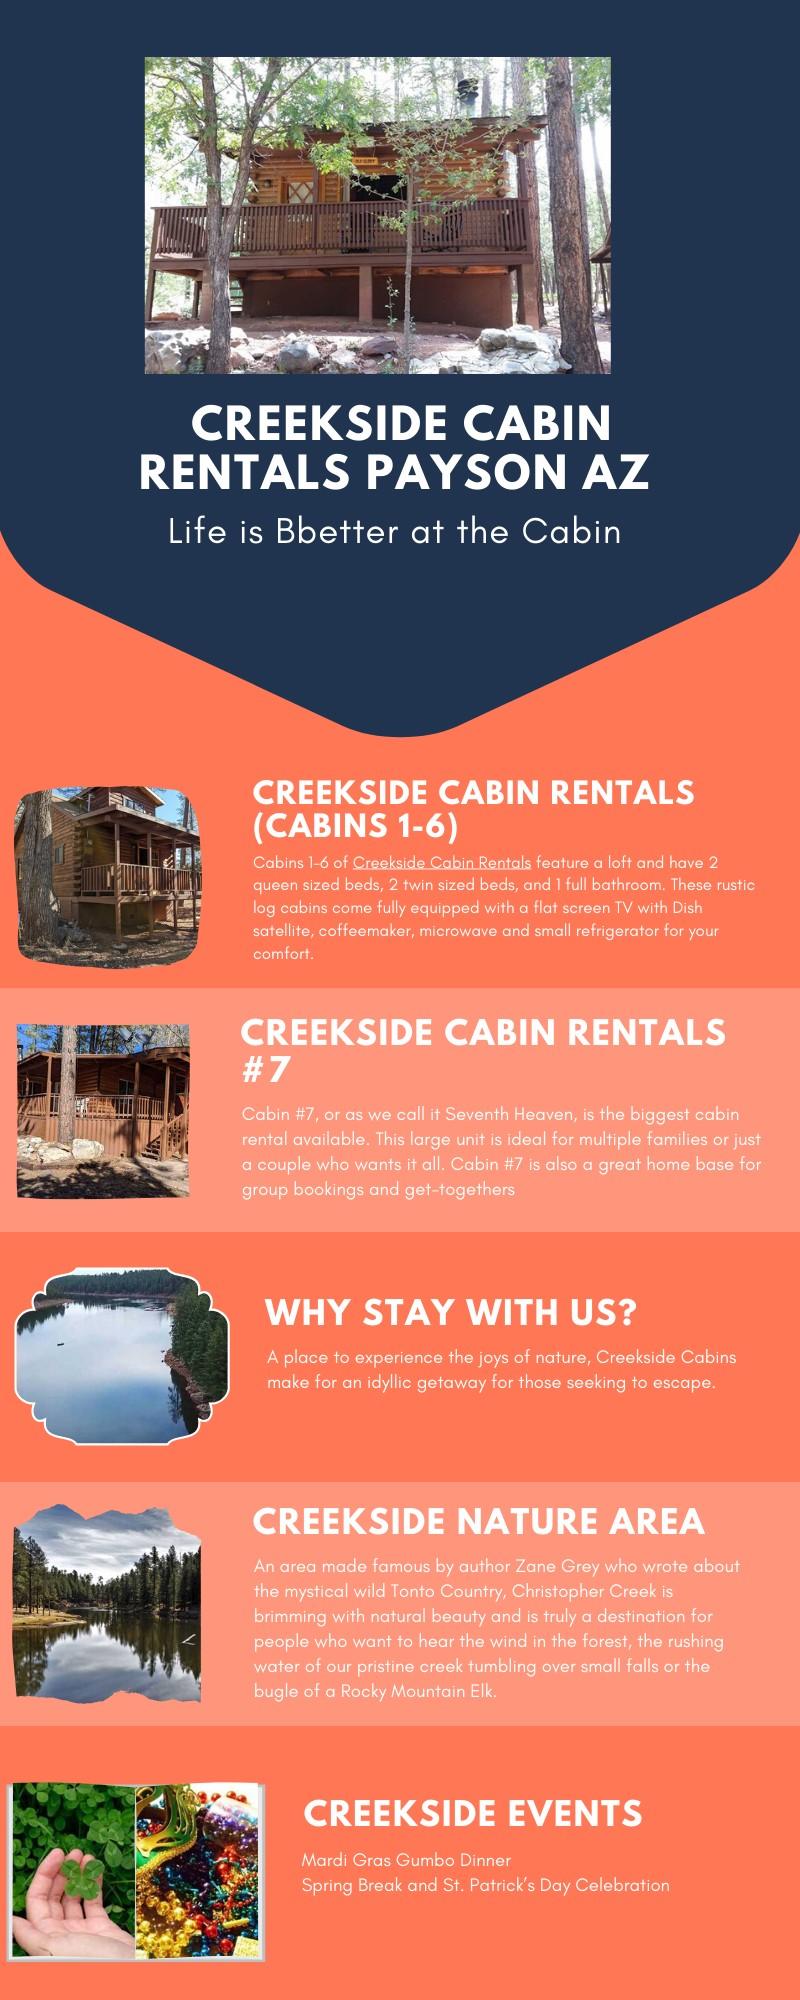 Creekside Cabin Rentals Payson AZ